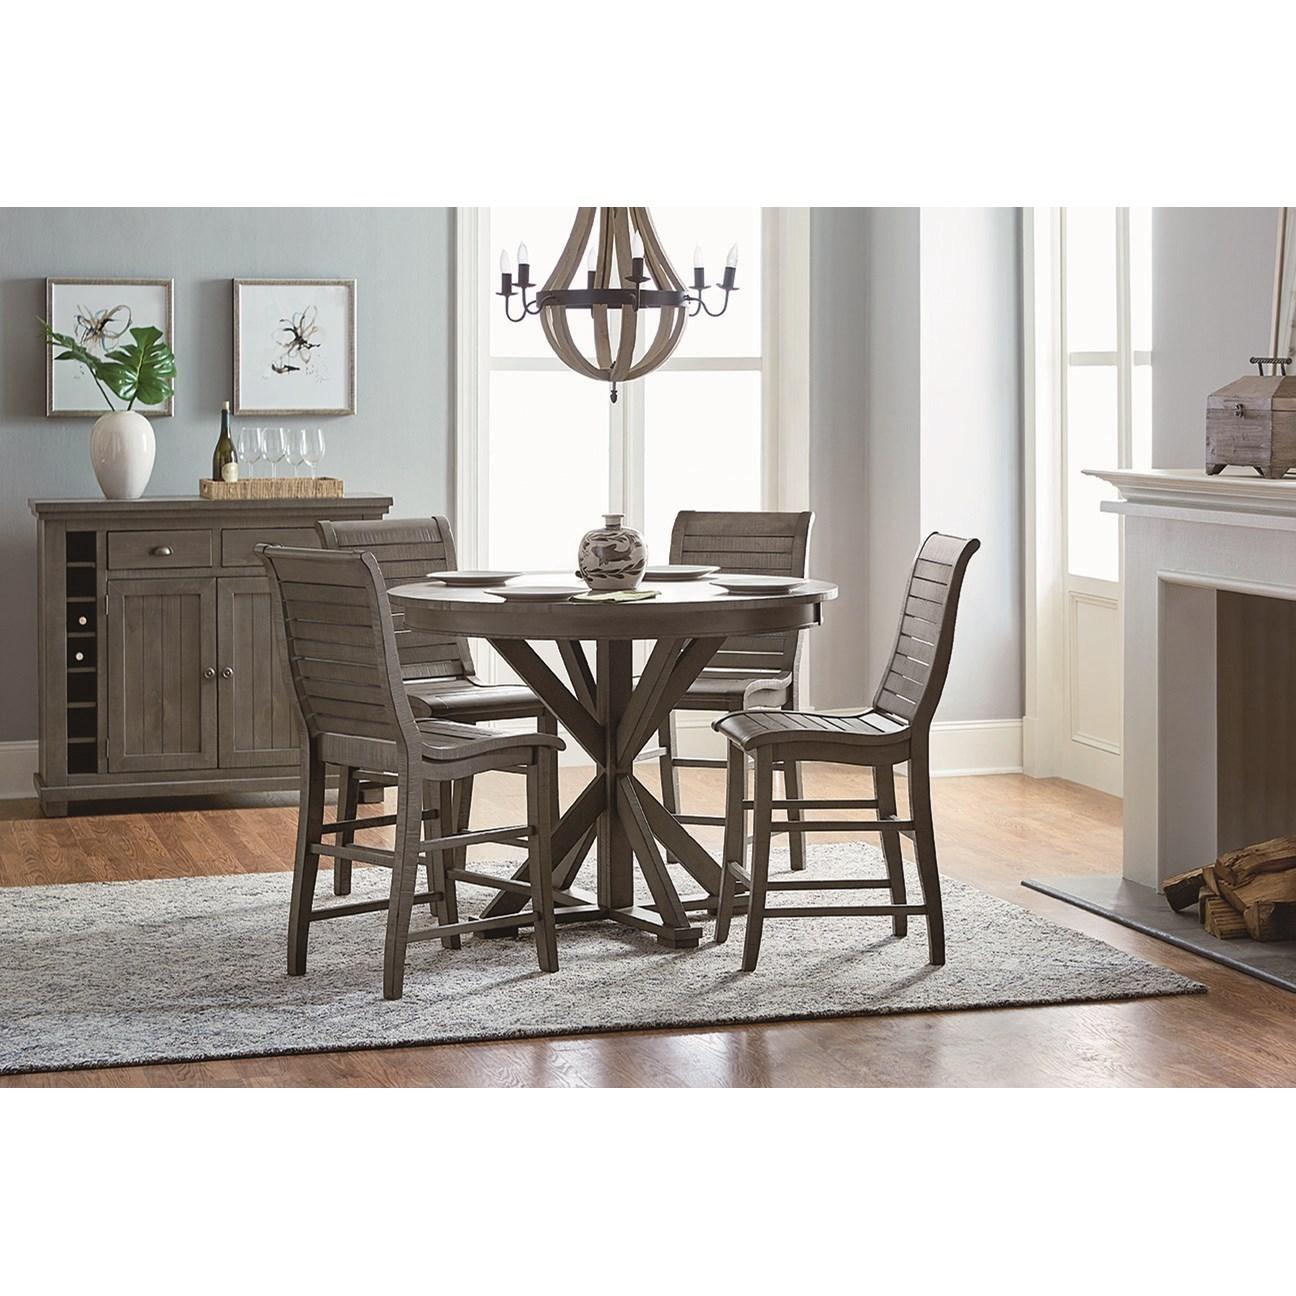 Progressive furniture willow dining casual dining room for Casual dining furniture